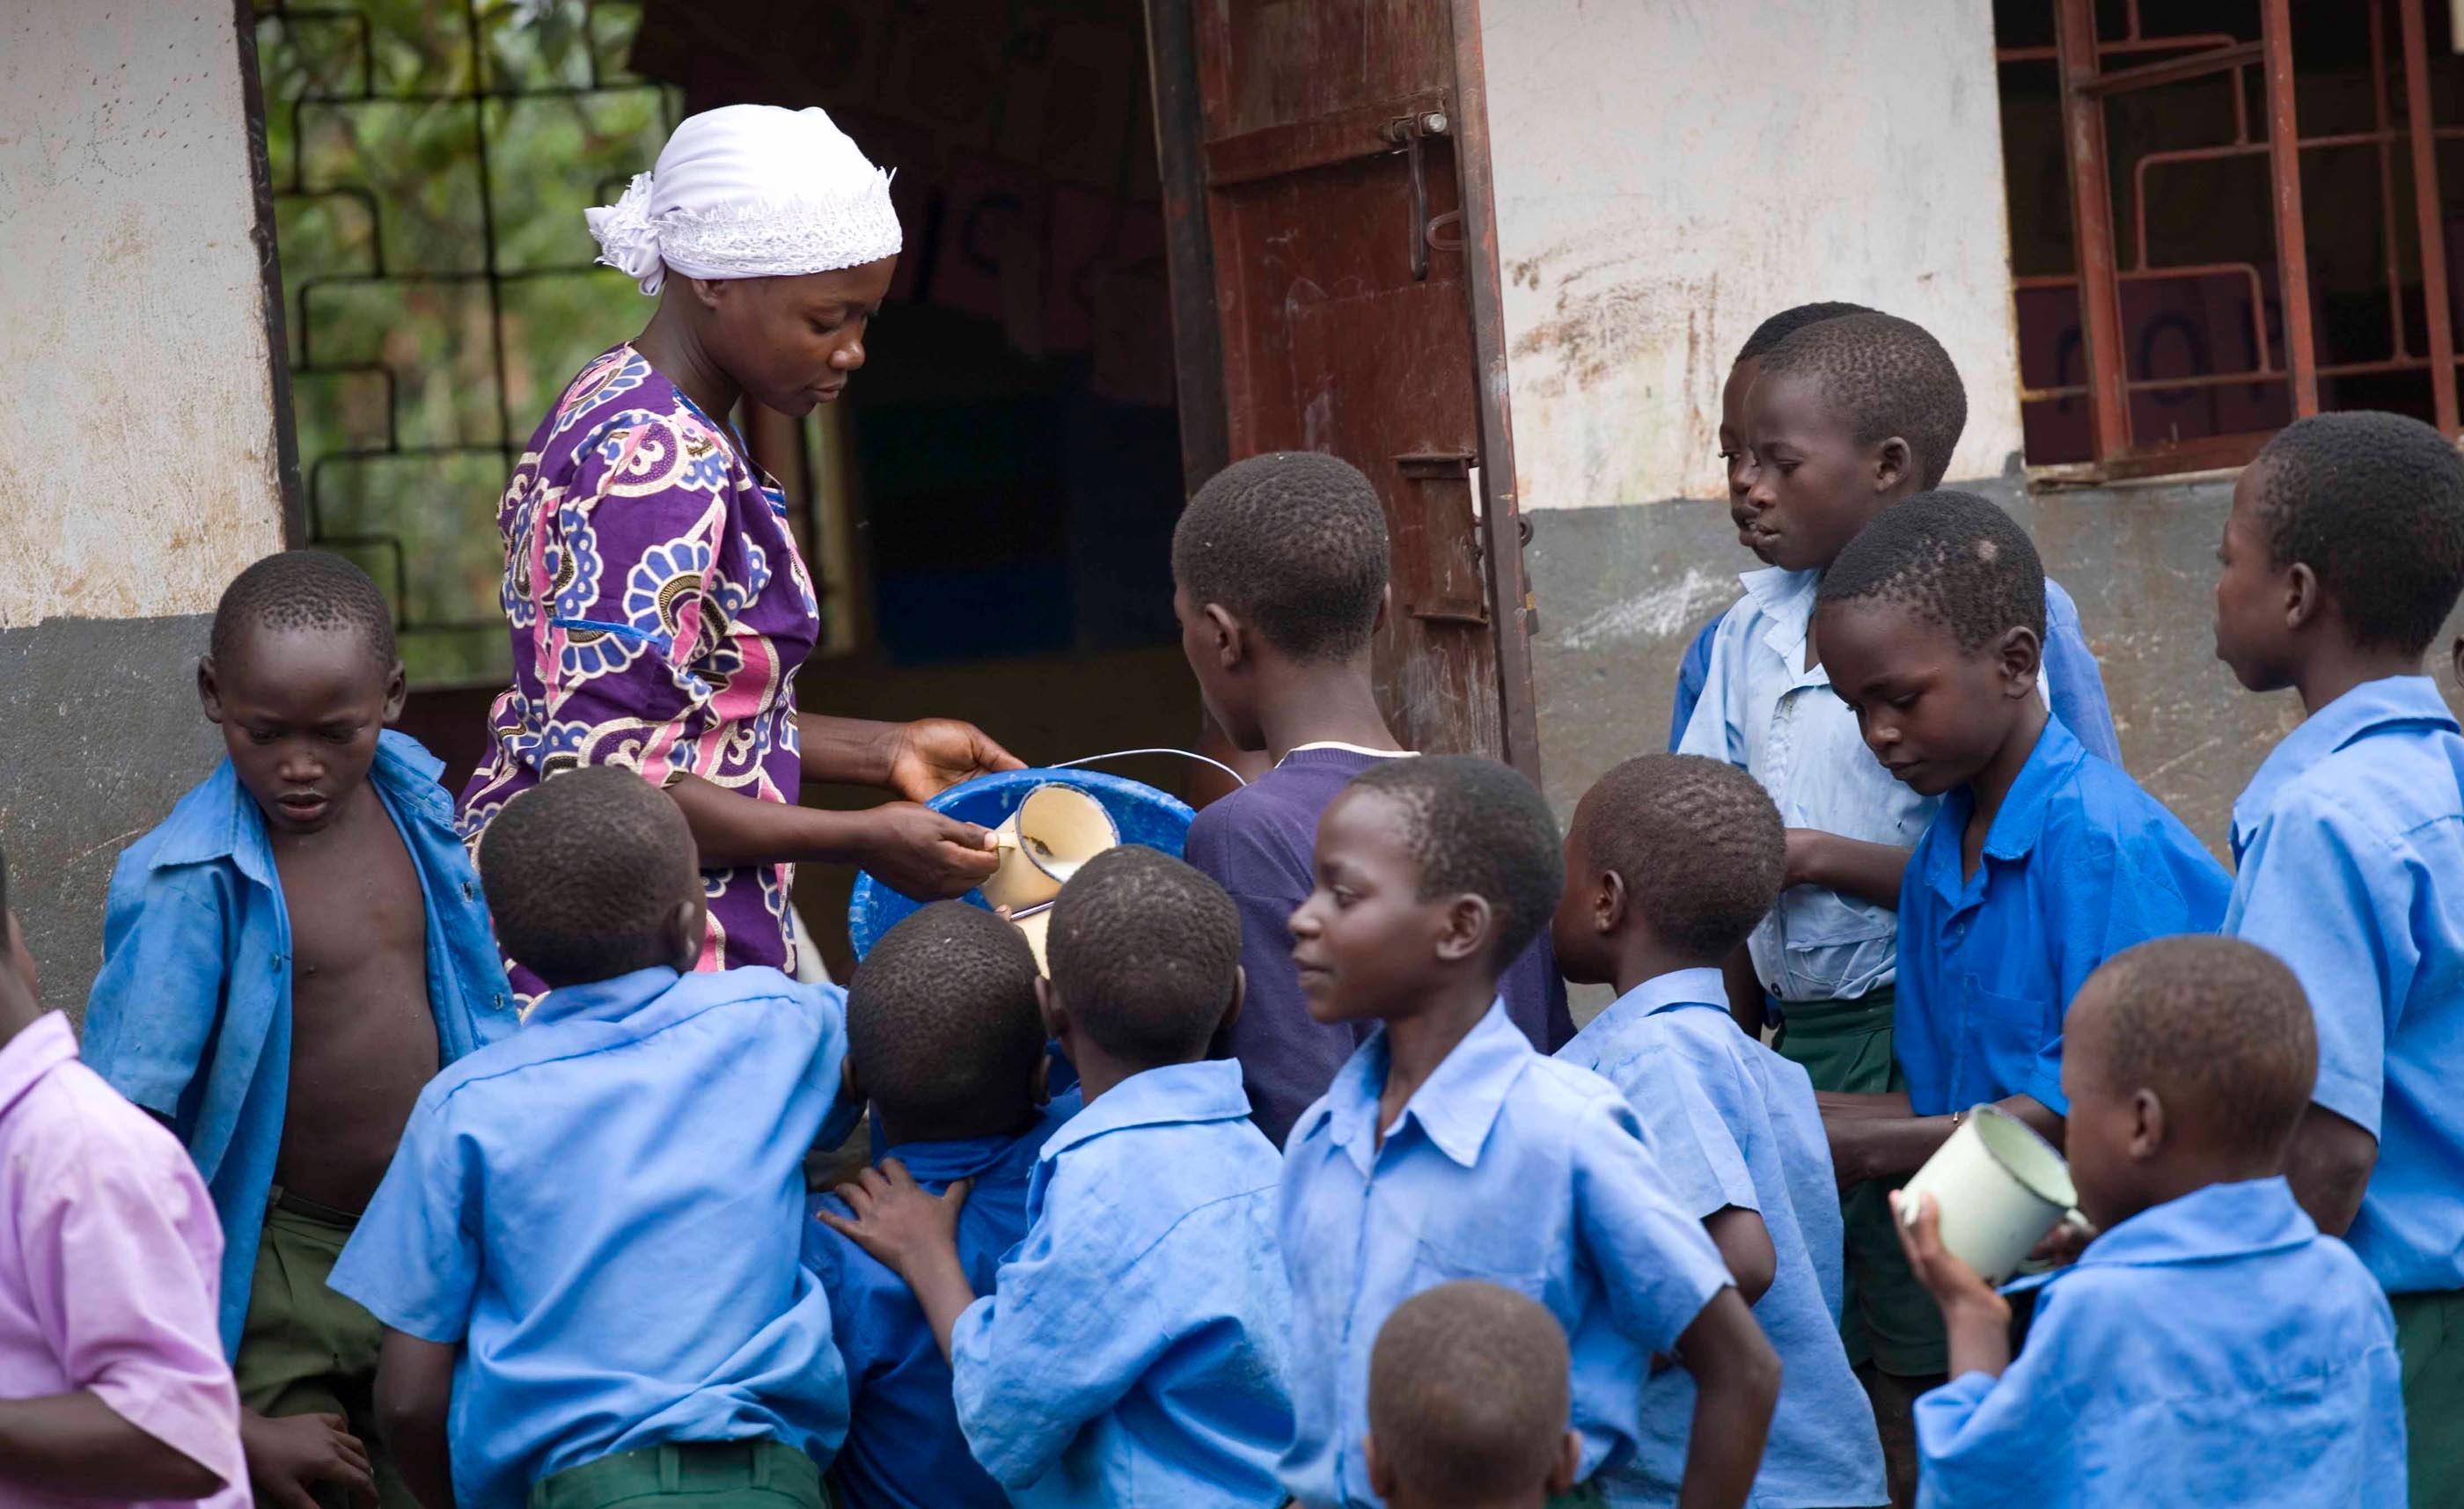 ugandan jews look to jewish world for help with famine